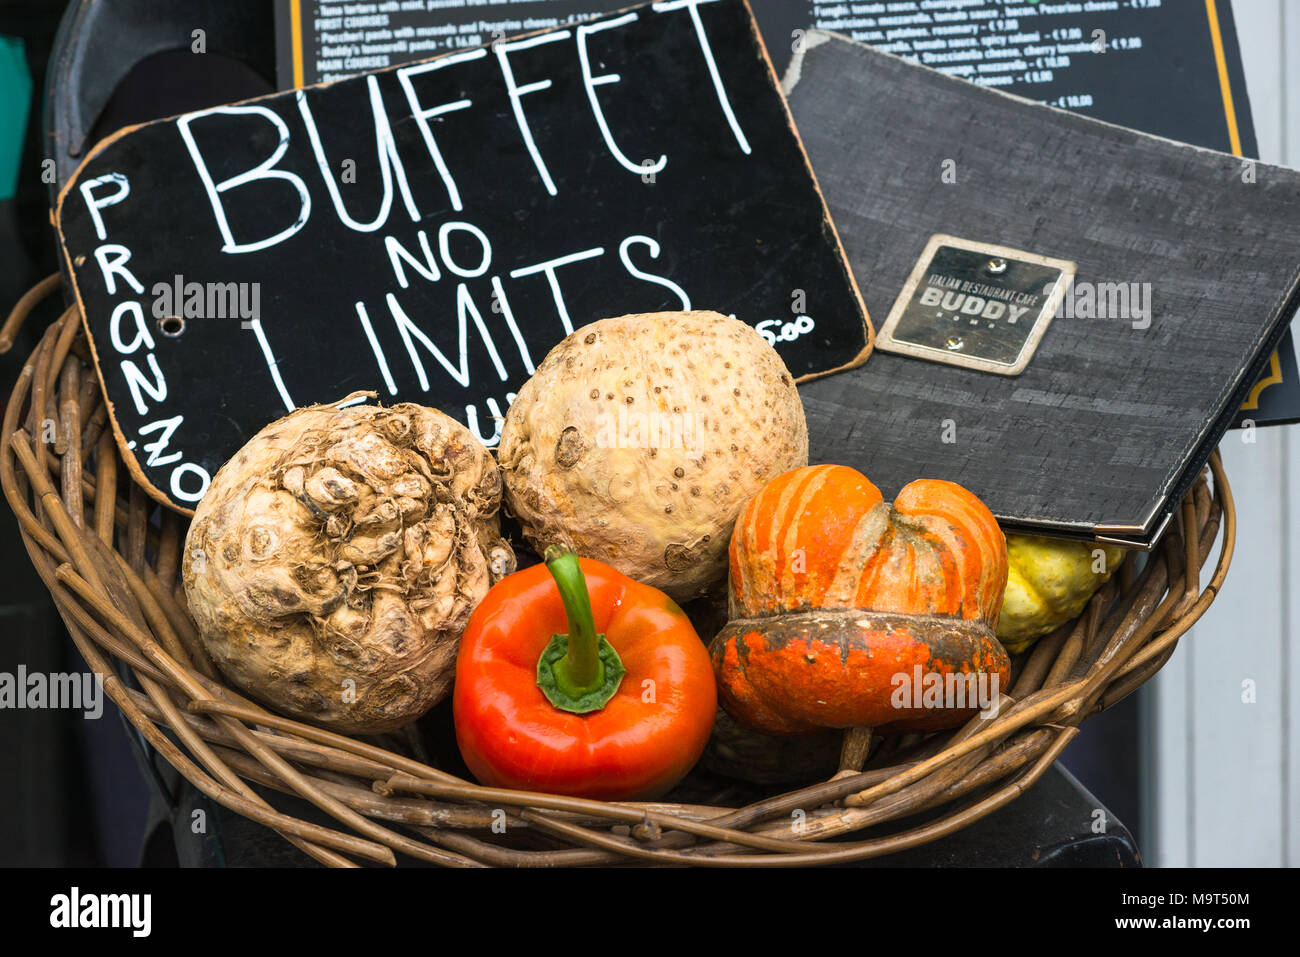 Buffet no limits display at Rome Restaurant, Lazio, Italy. - Stock Image